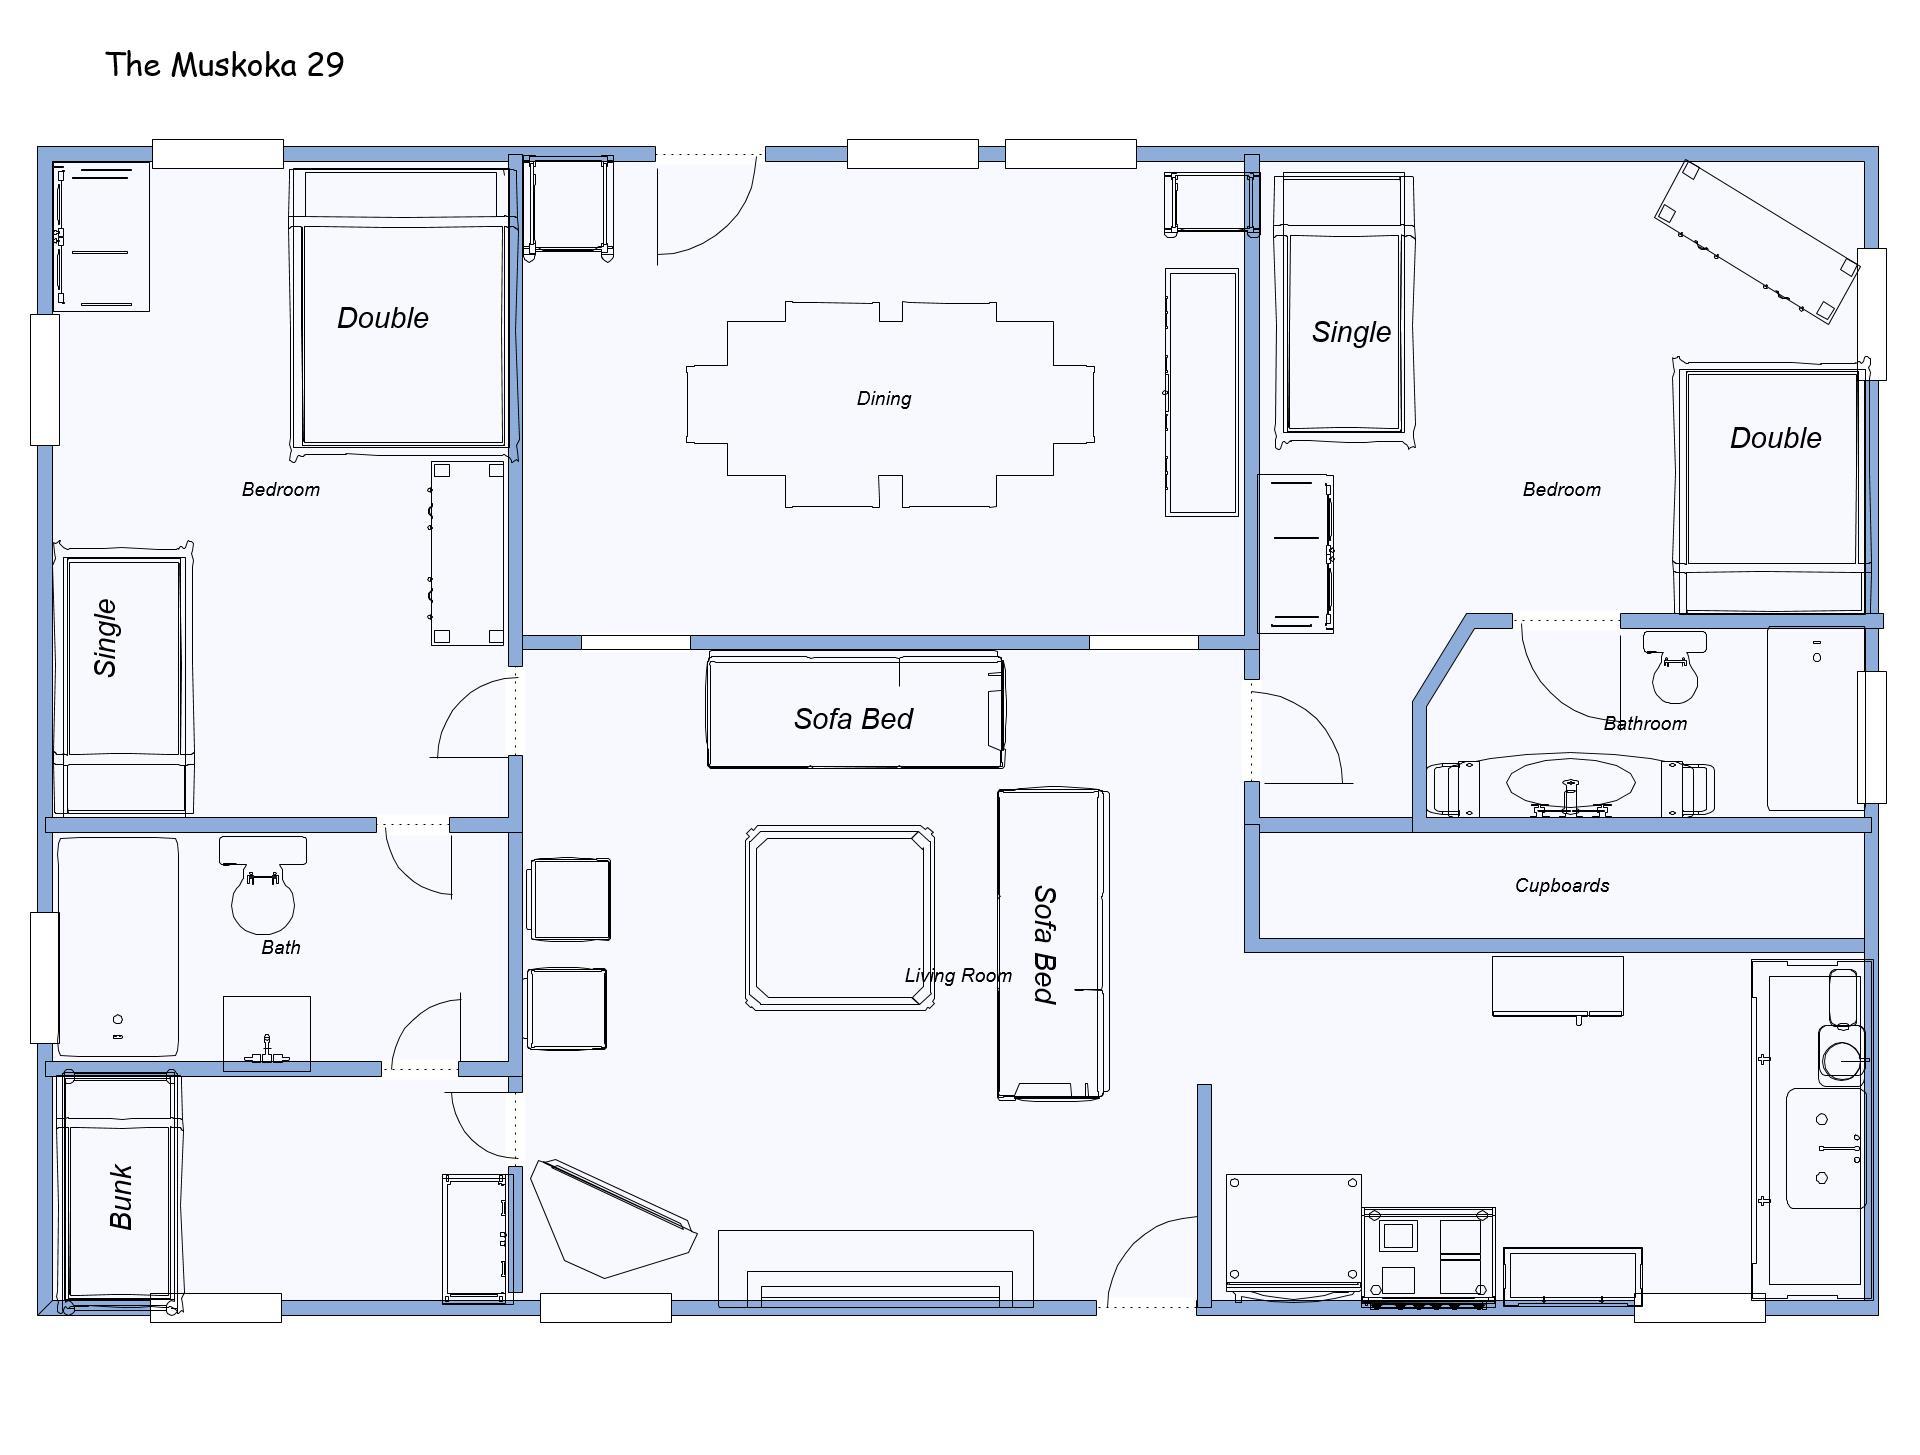 Muskoka 29 beds labeled